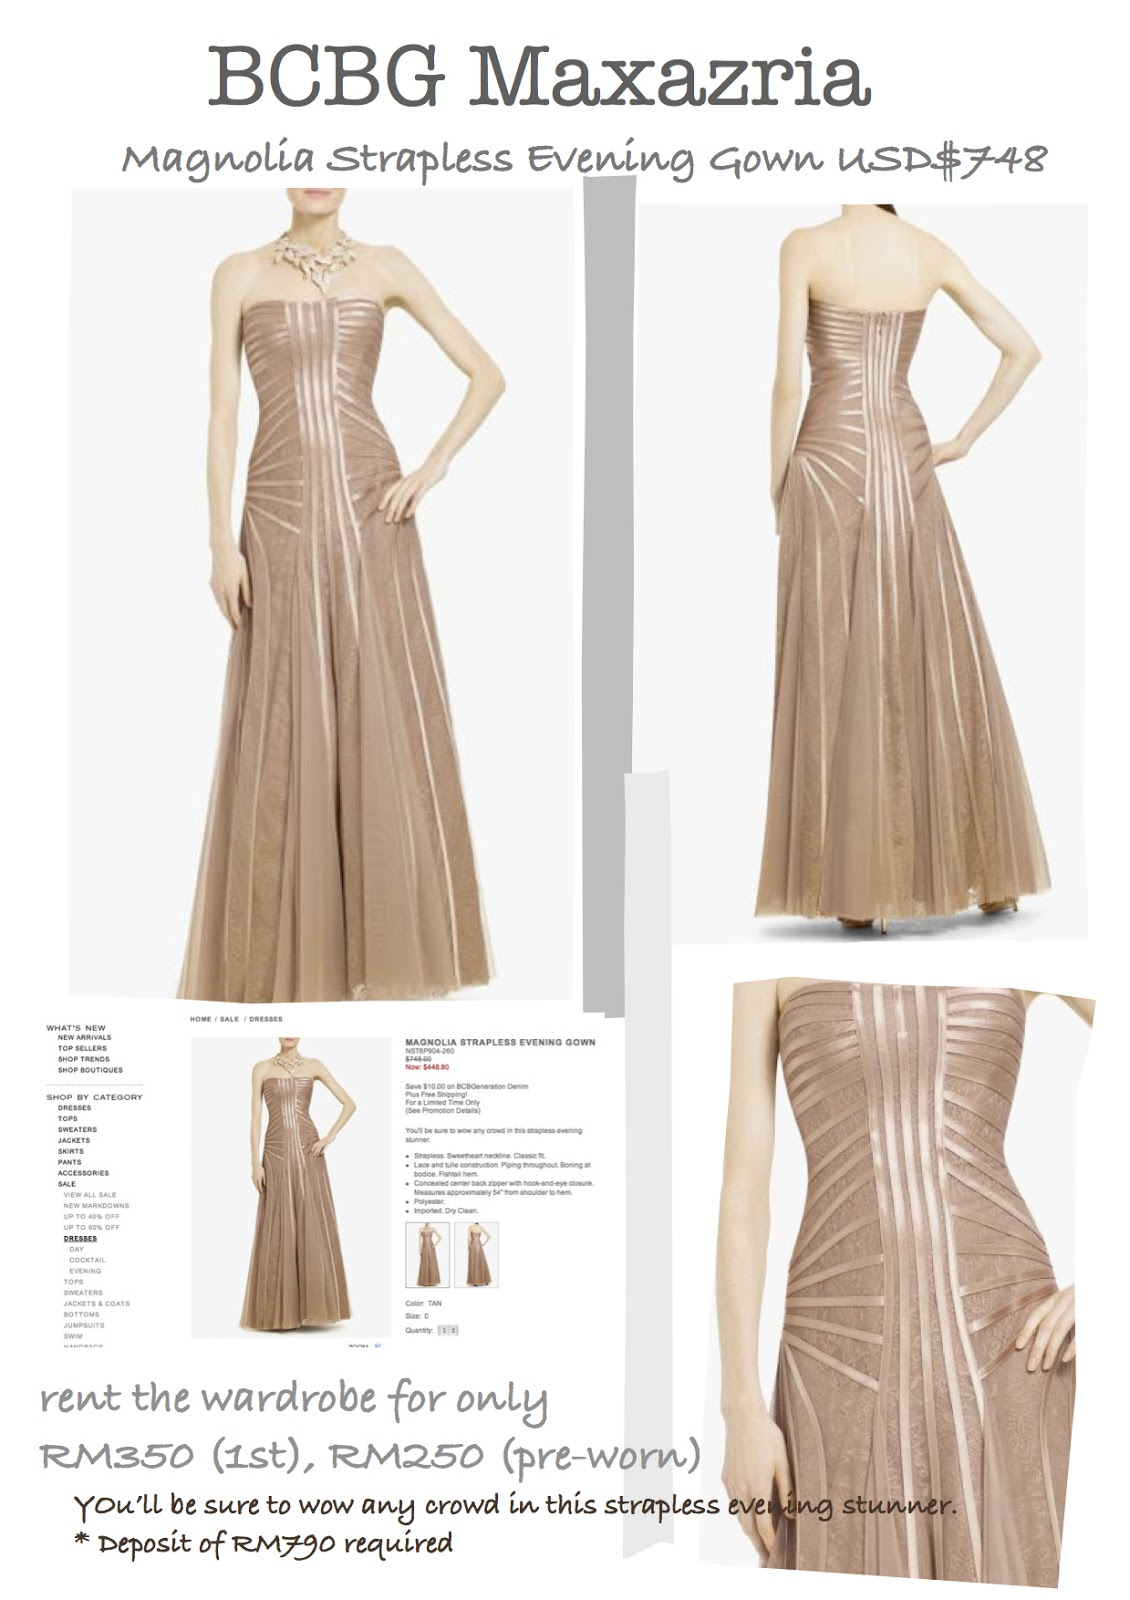 f72efb8ca3a4 BCBG Maxazria Magnolia Strapless Evening Gown USD$748 | Rent The ...